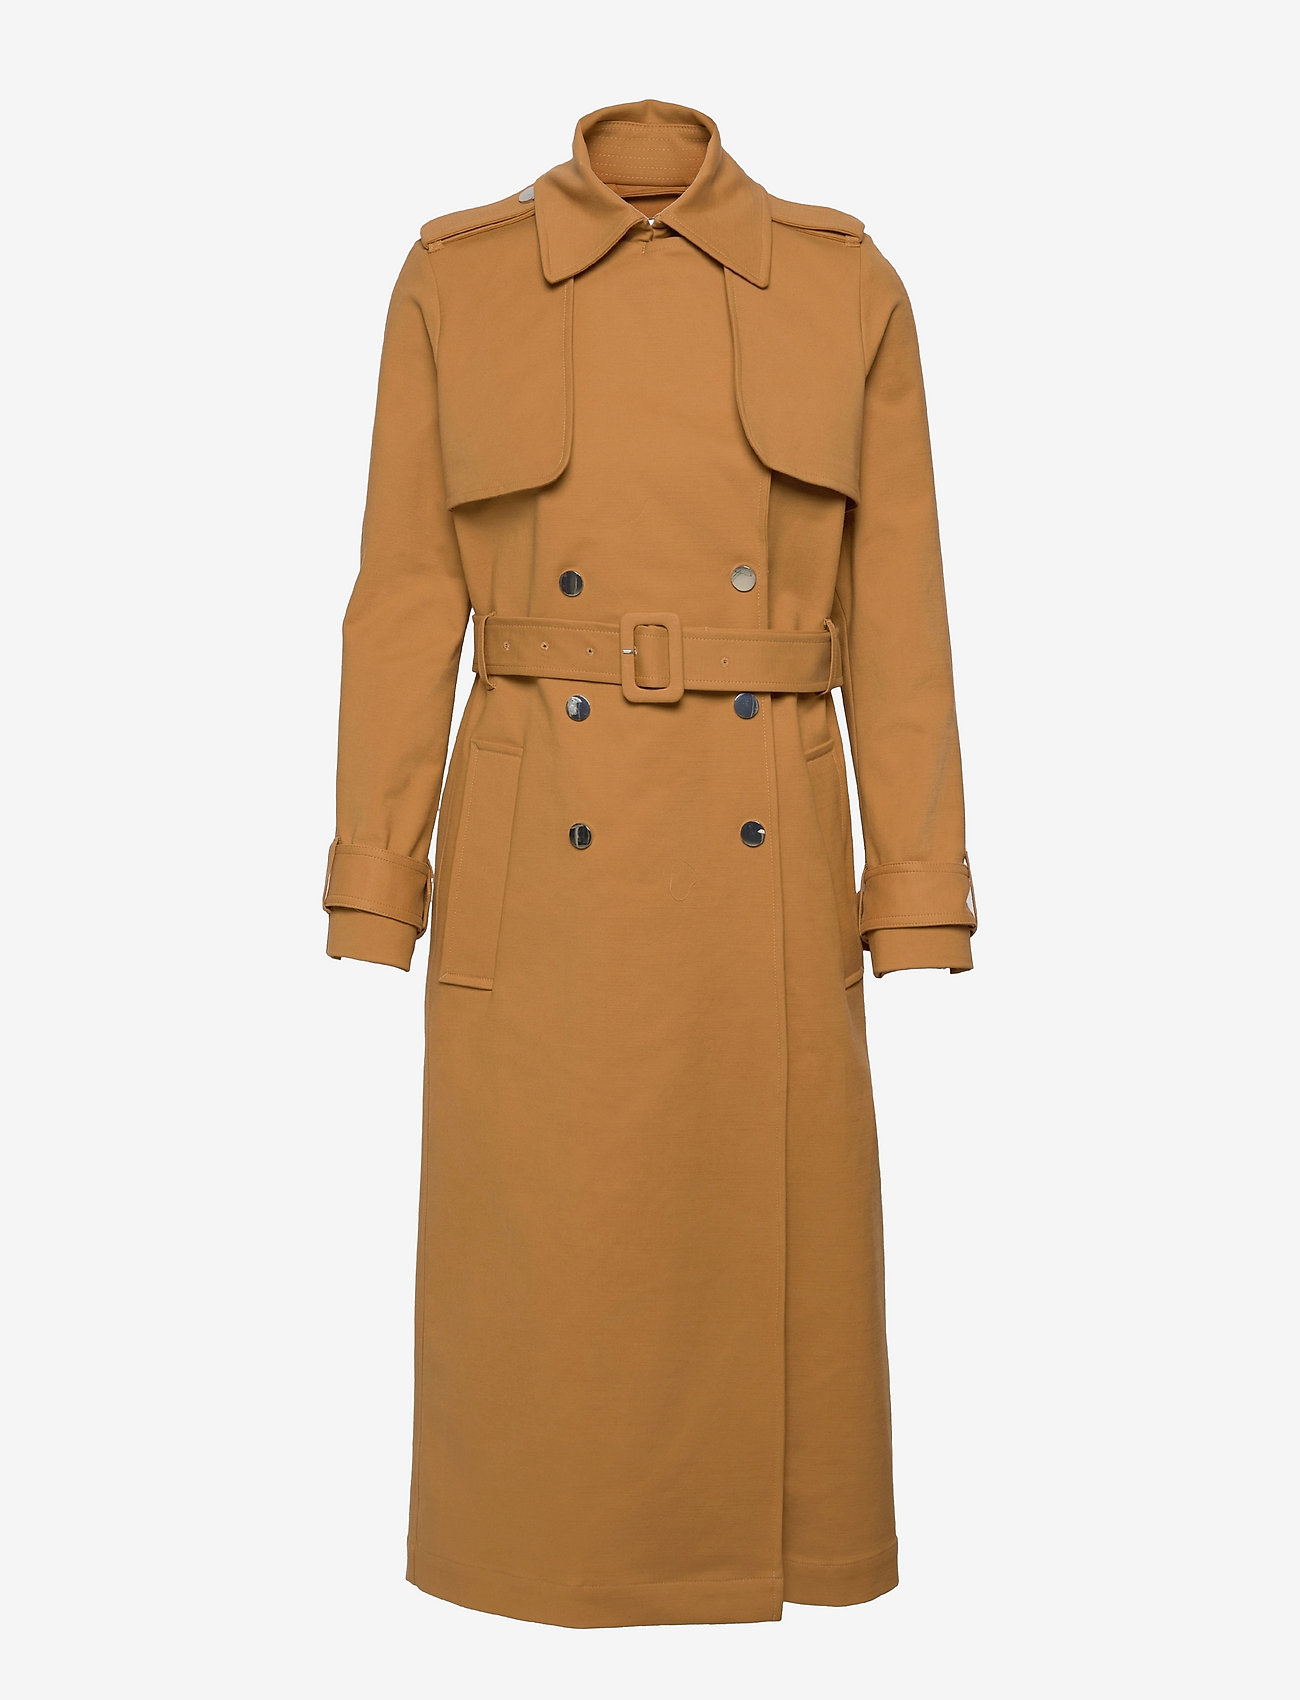 Ivy & Oak - PUKA - trench coats - morroccan sand - 0